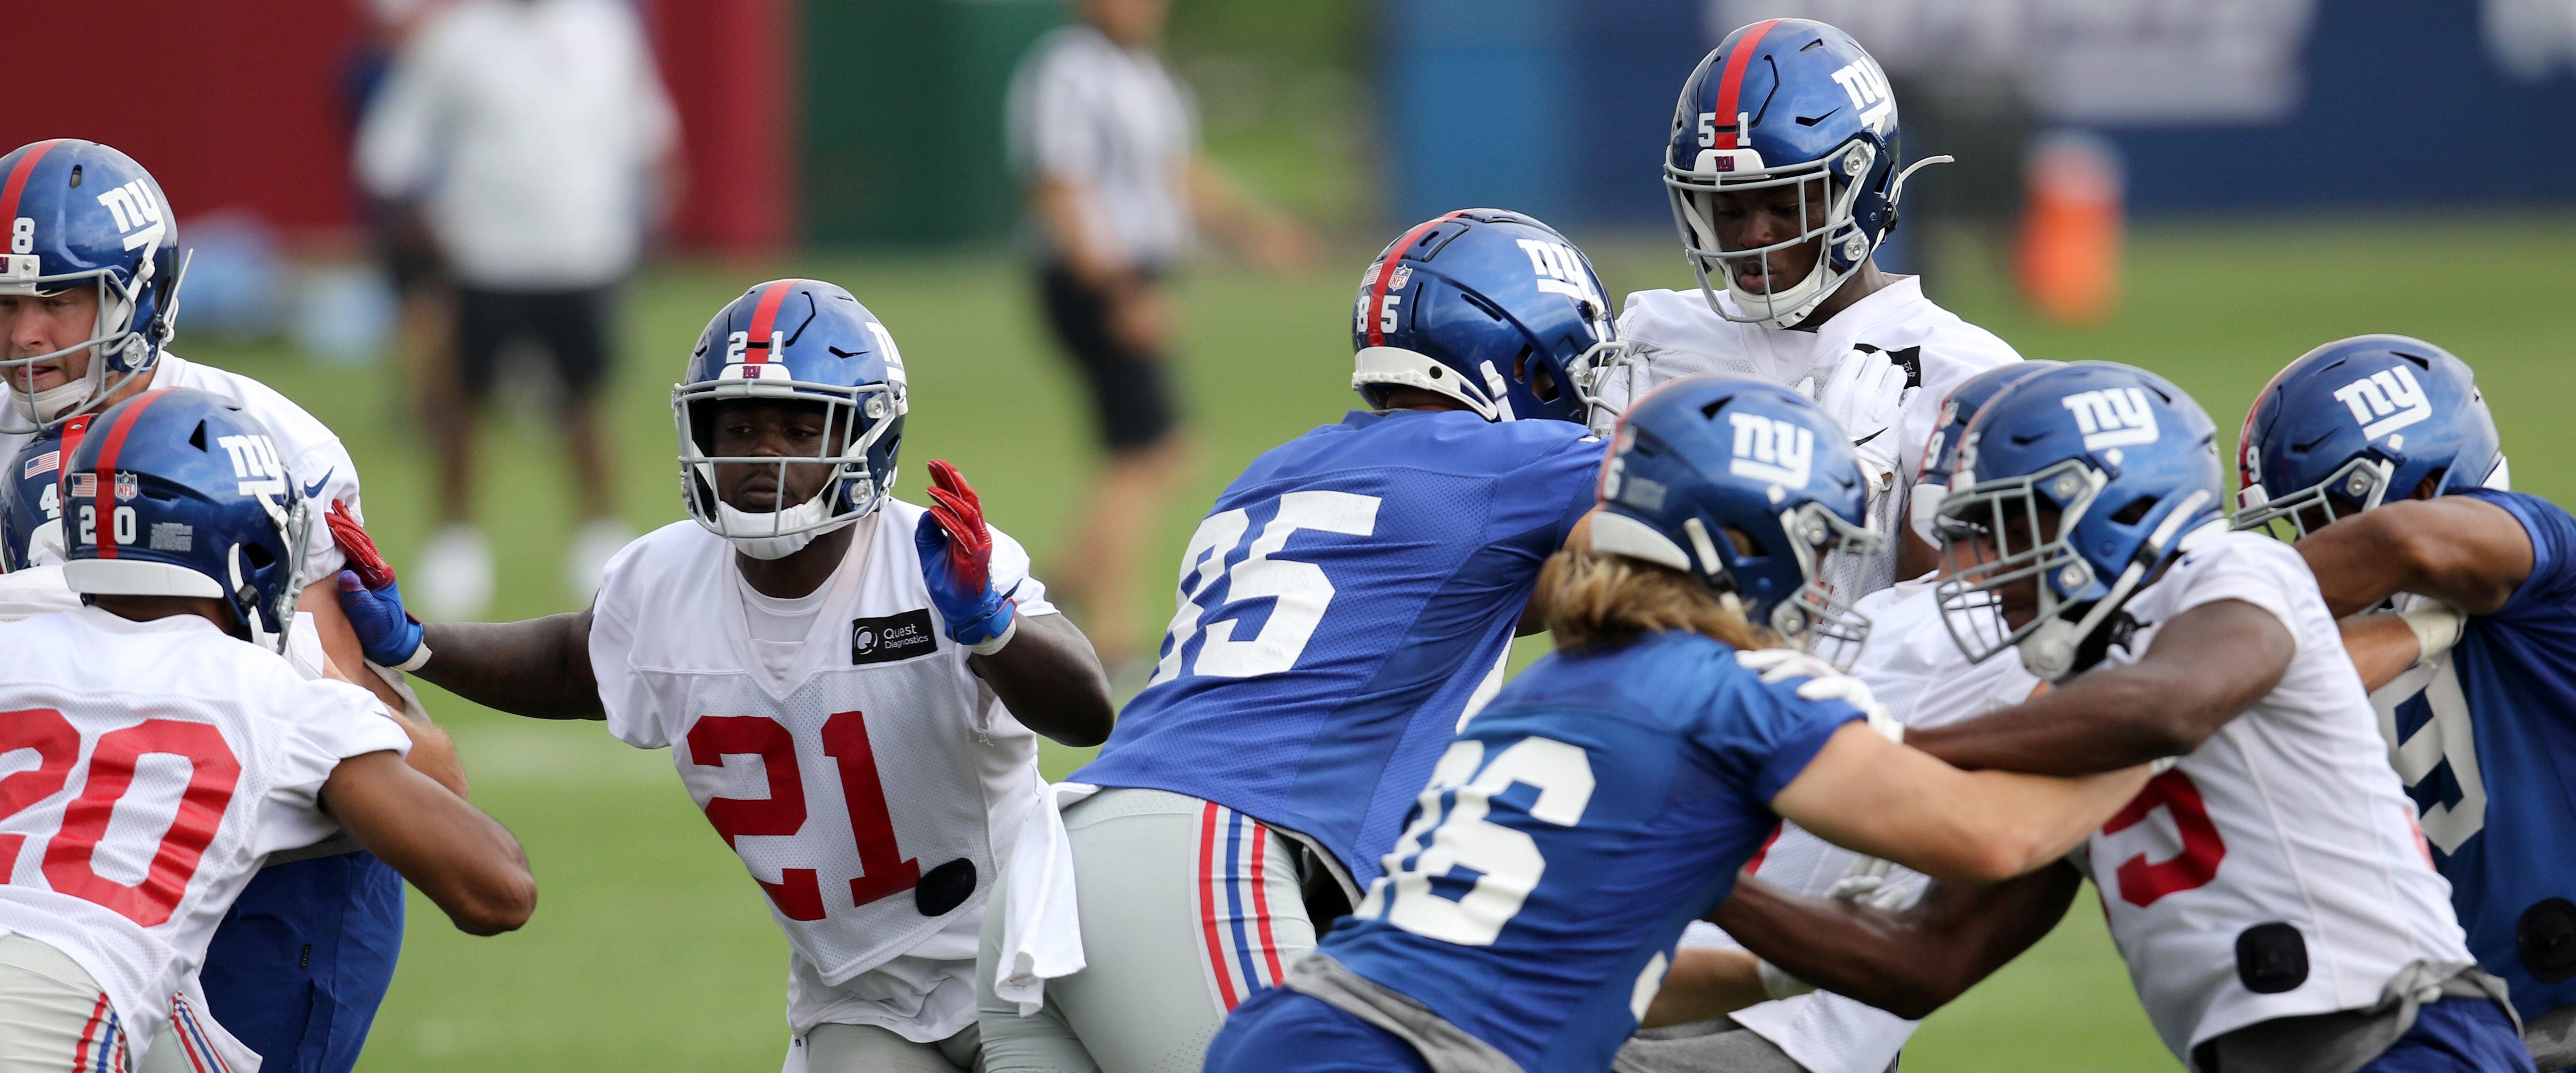 WHAT?! A brawl shuts down New York Giants practice